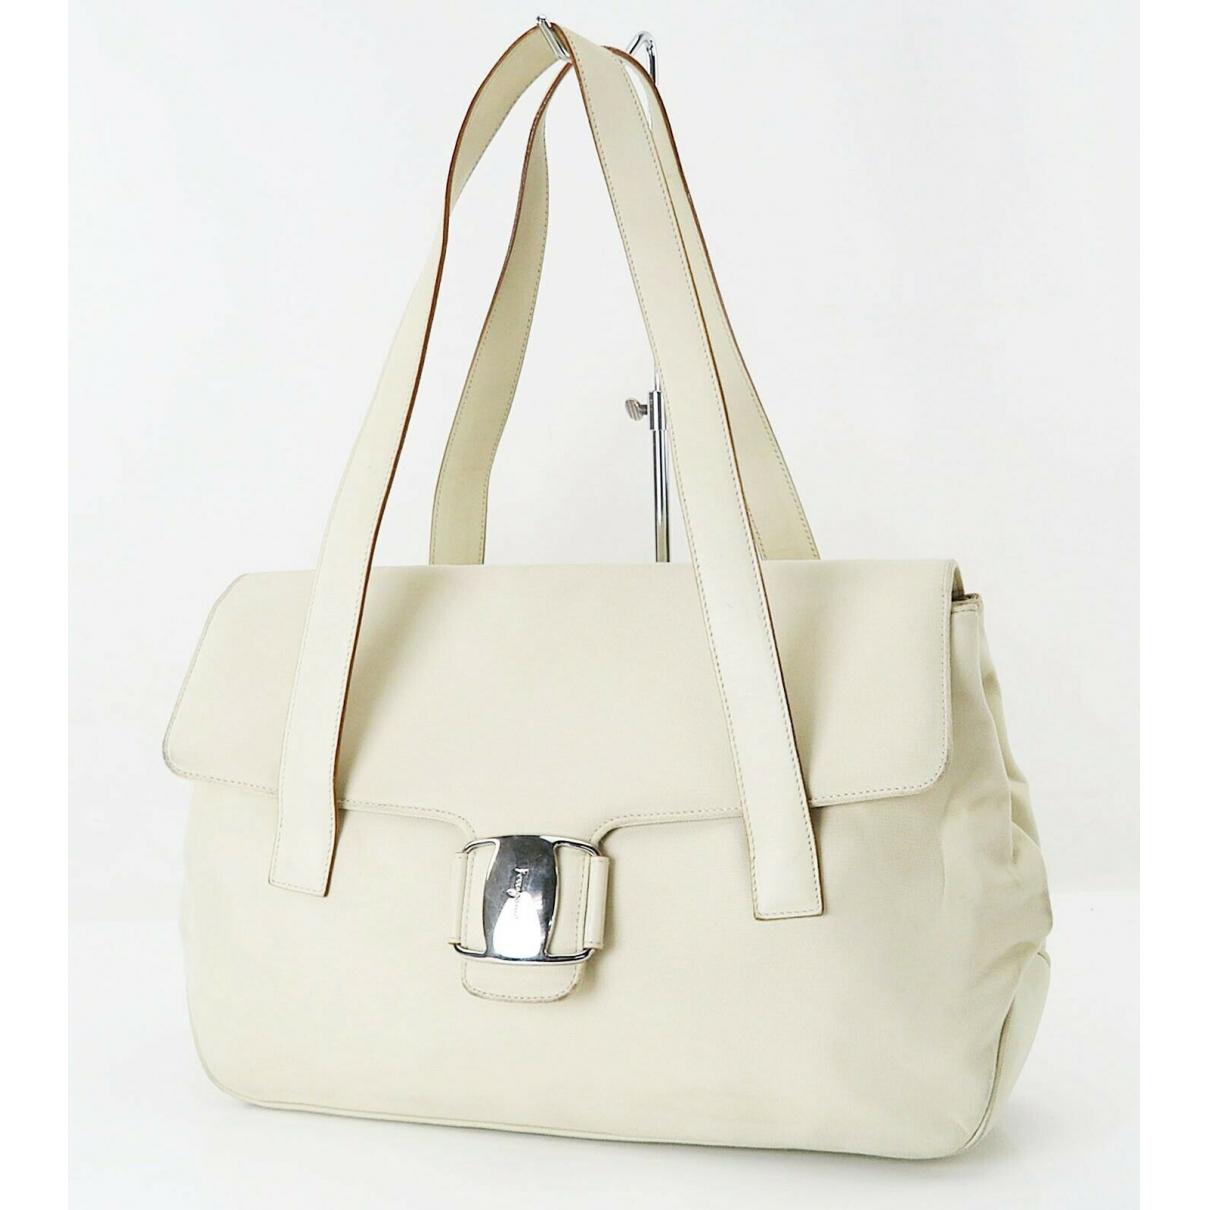 Salvatore Ferragamo \N White Leather handbag for Women \N